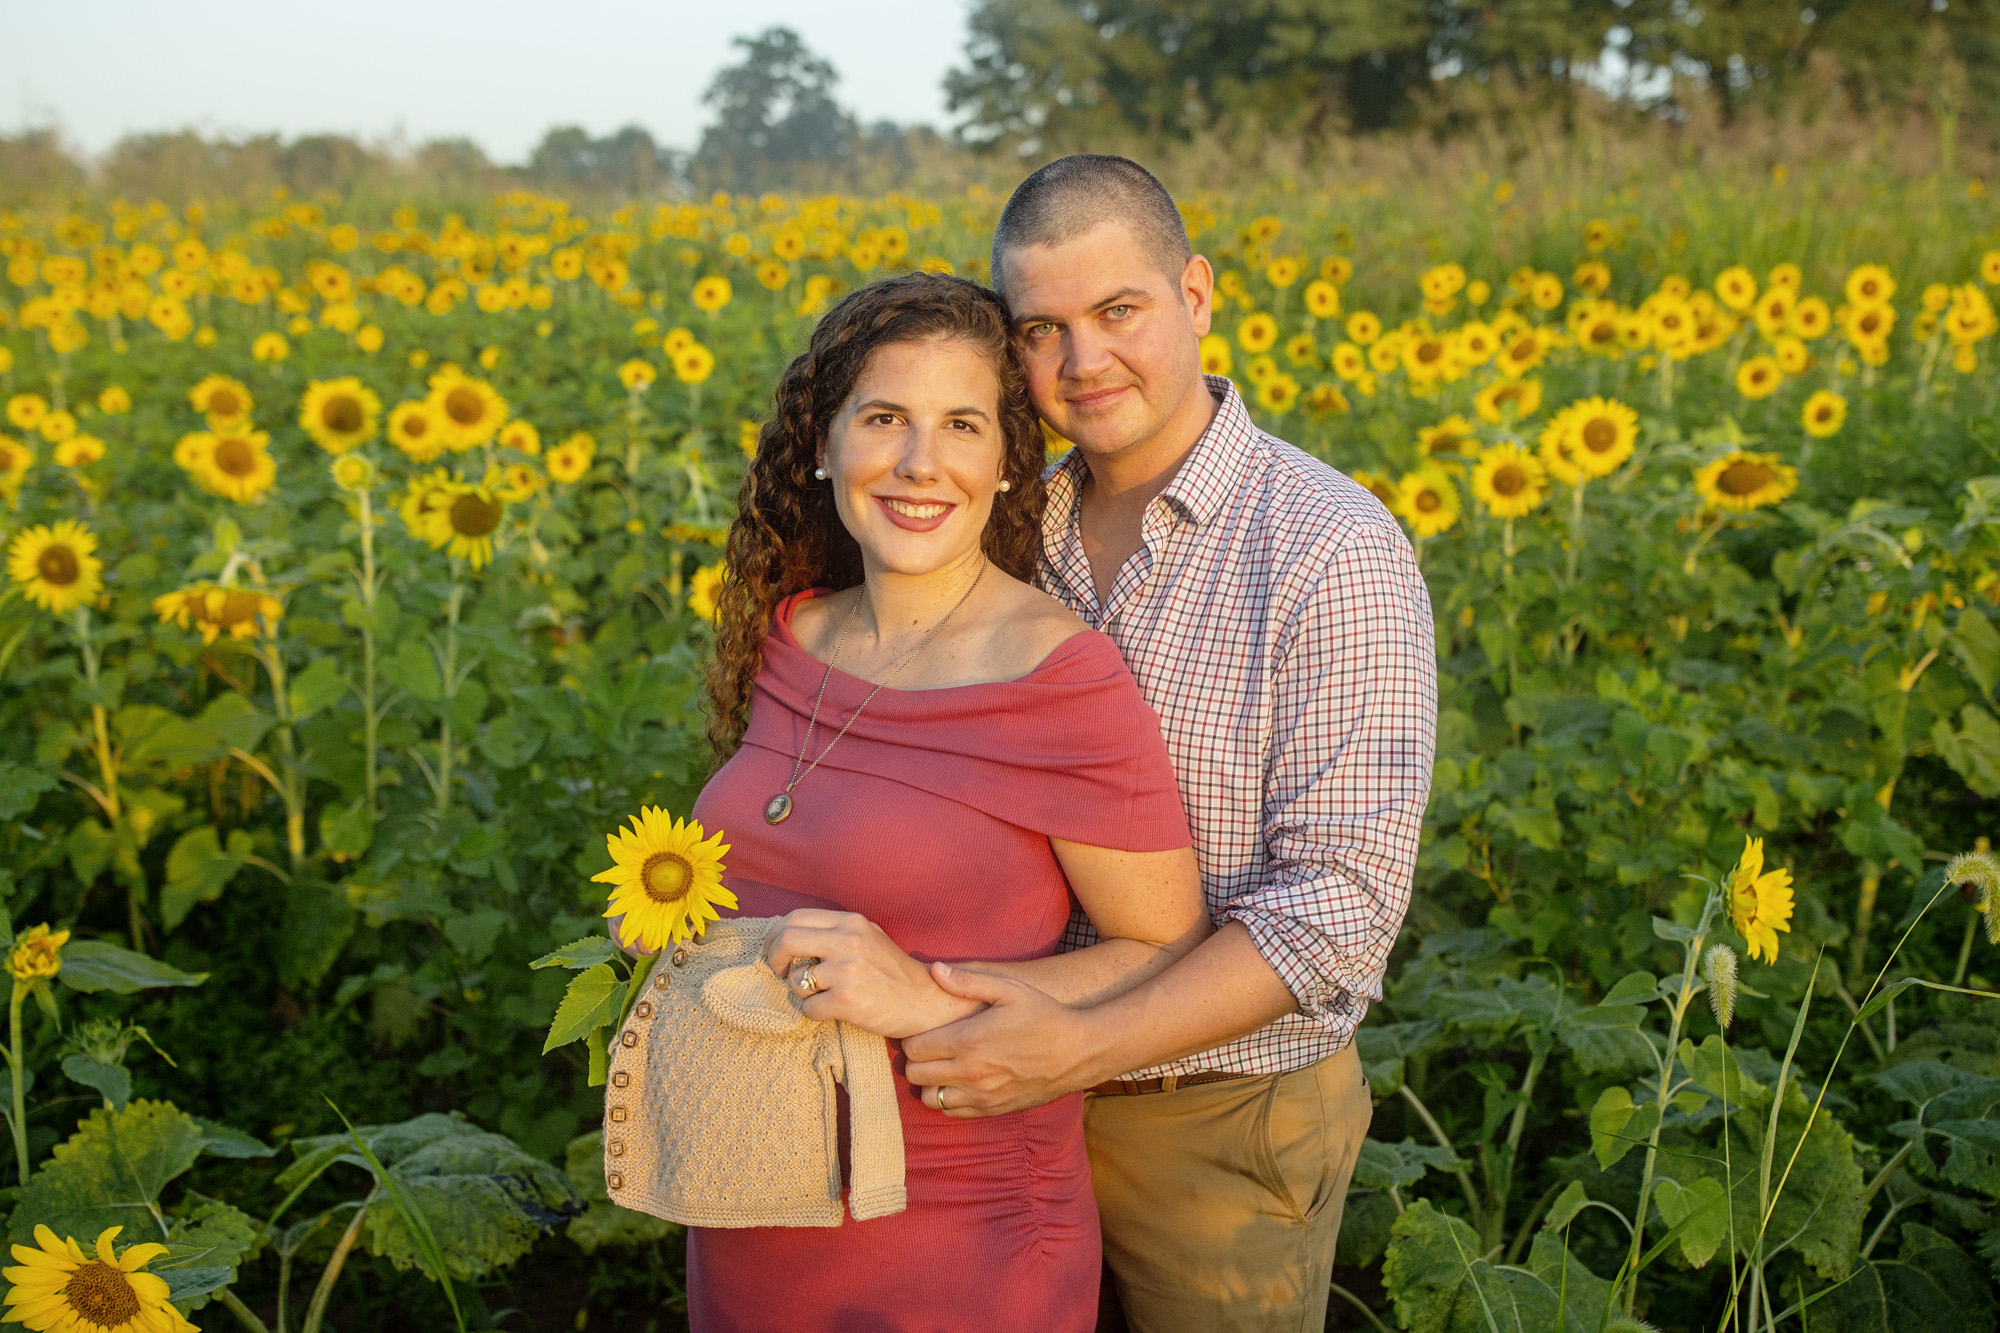 Seriously_Sabrina_Photography_Lexington_Frankfort_Kentucky_Maternity_Mini_Sunflowers_Johns22.jpg